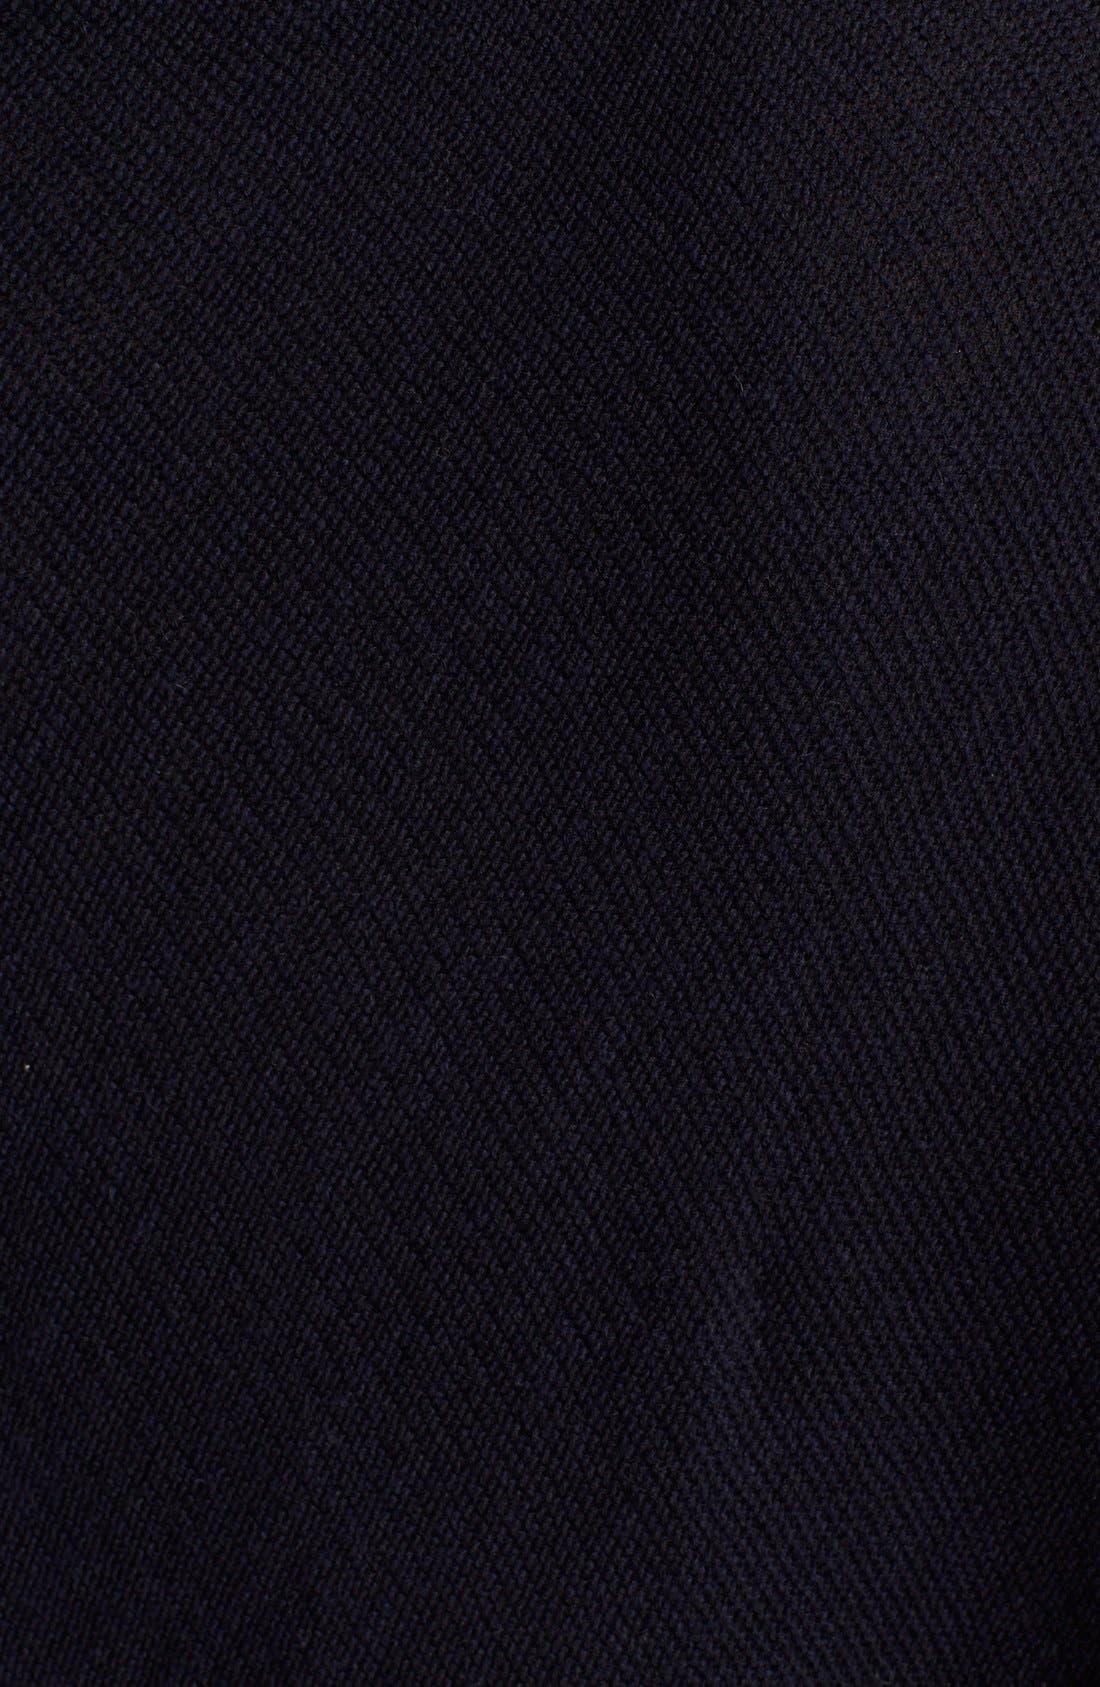 'Temptress' Drapey Cowl Sweater,                             Alternate thumbnail 3, color,                             001